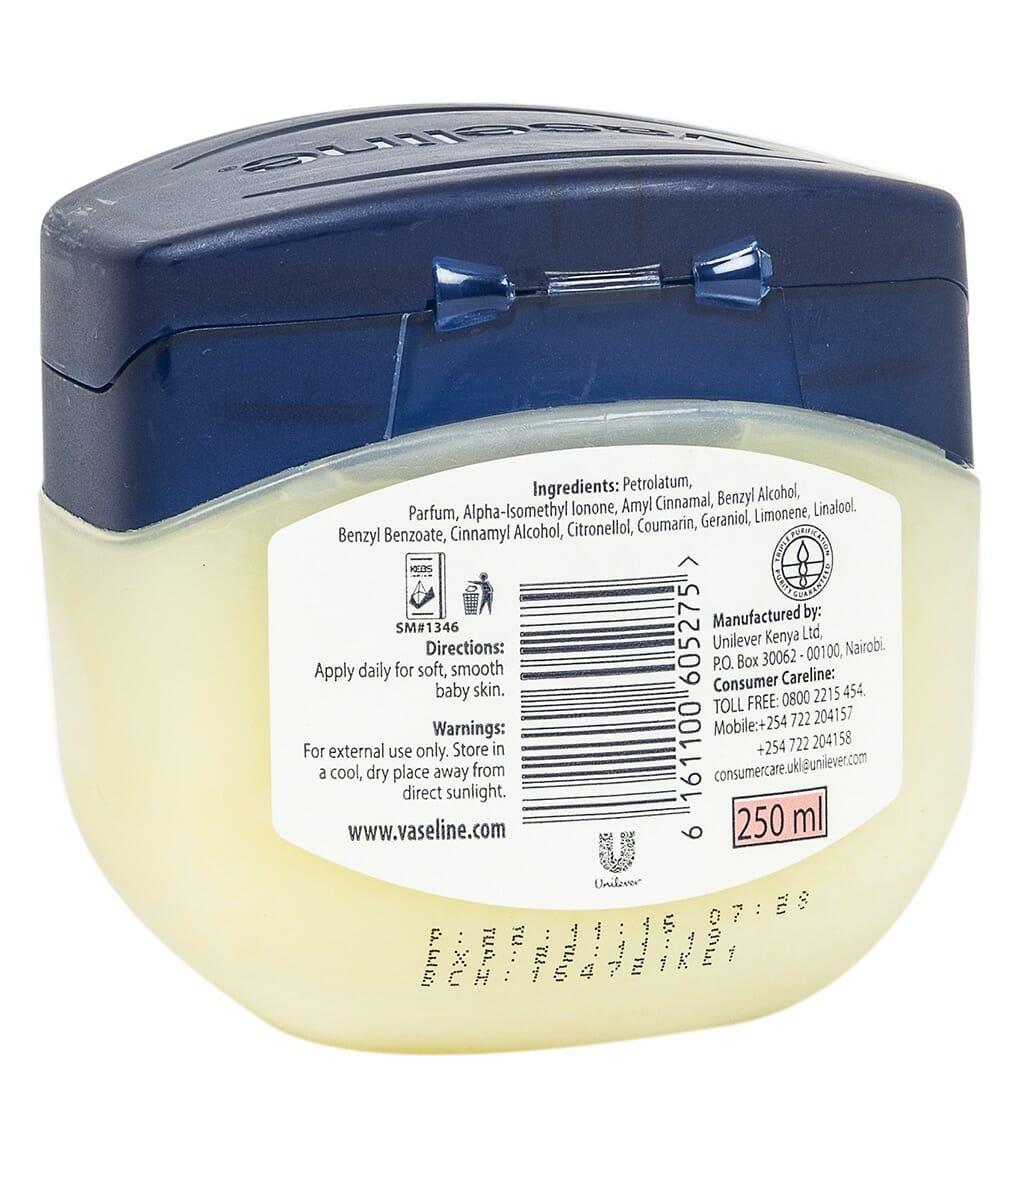 Vaseline Blueseal Gentle Protective Baby Jelly 250g